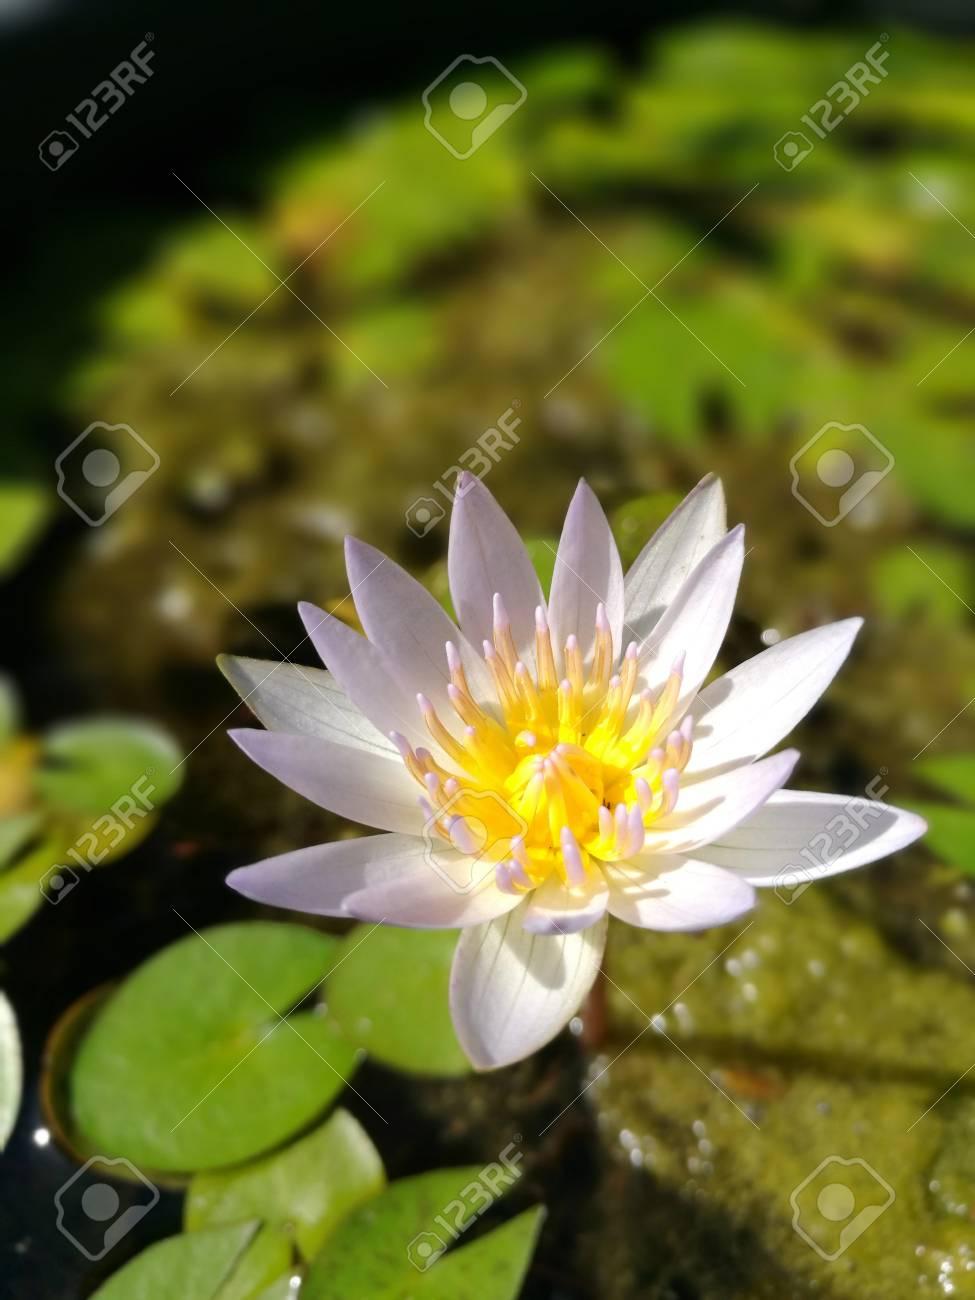 Beautiful white lotus flower in the sunny day with shallow depth beautiful white lotus flower in the sunny day with shallow depth of field stock photo izmirmasajfo